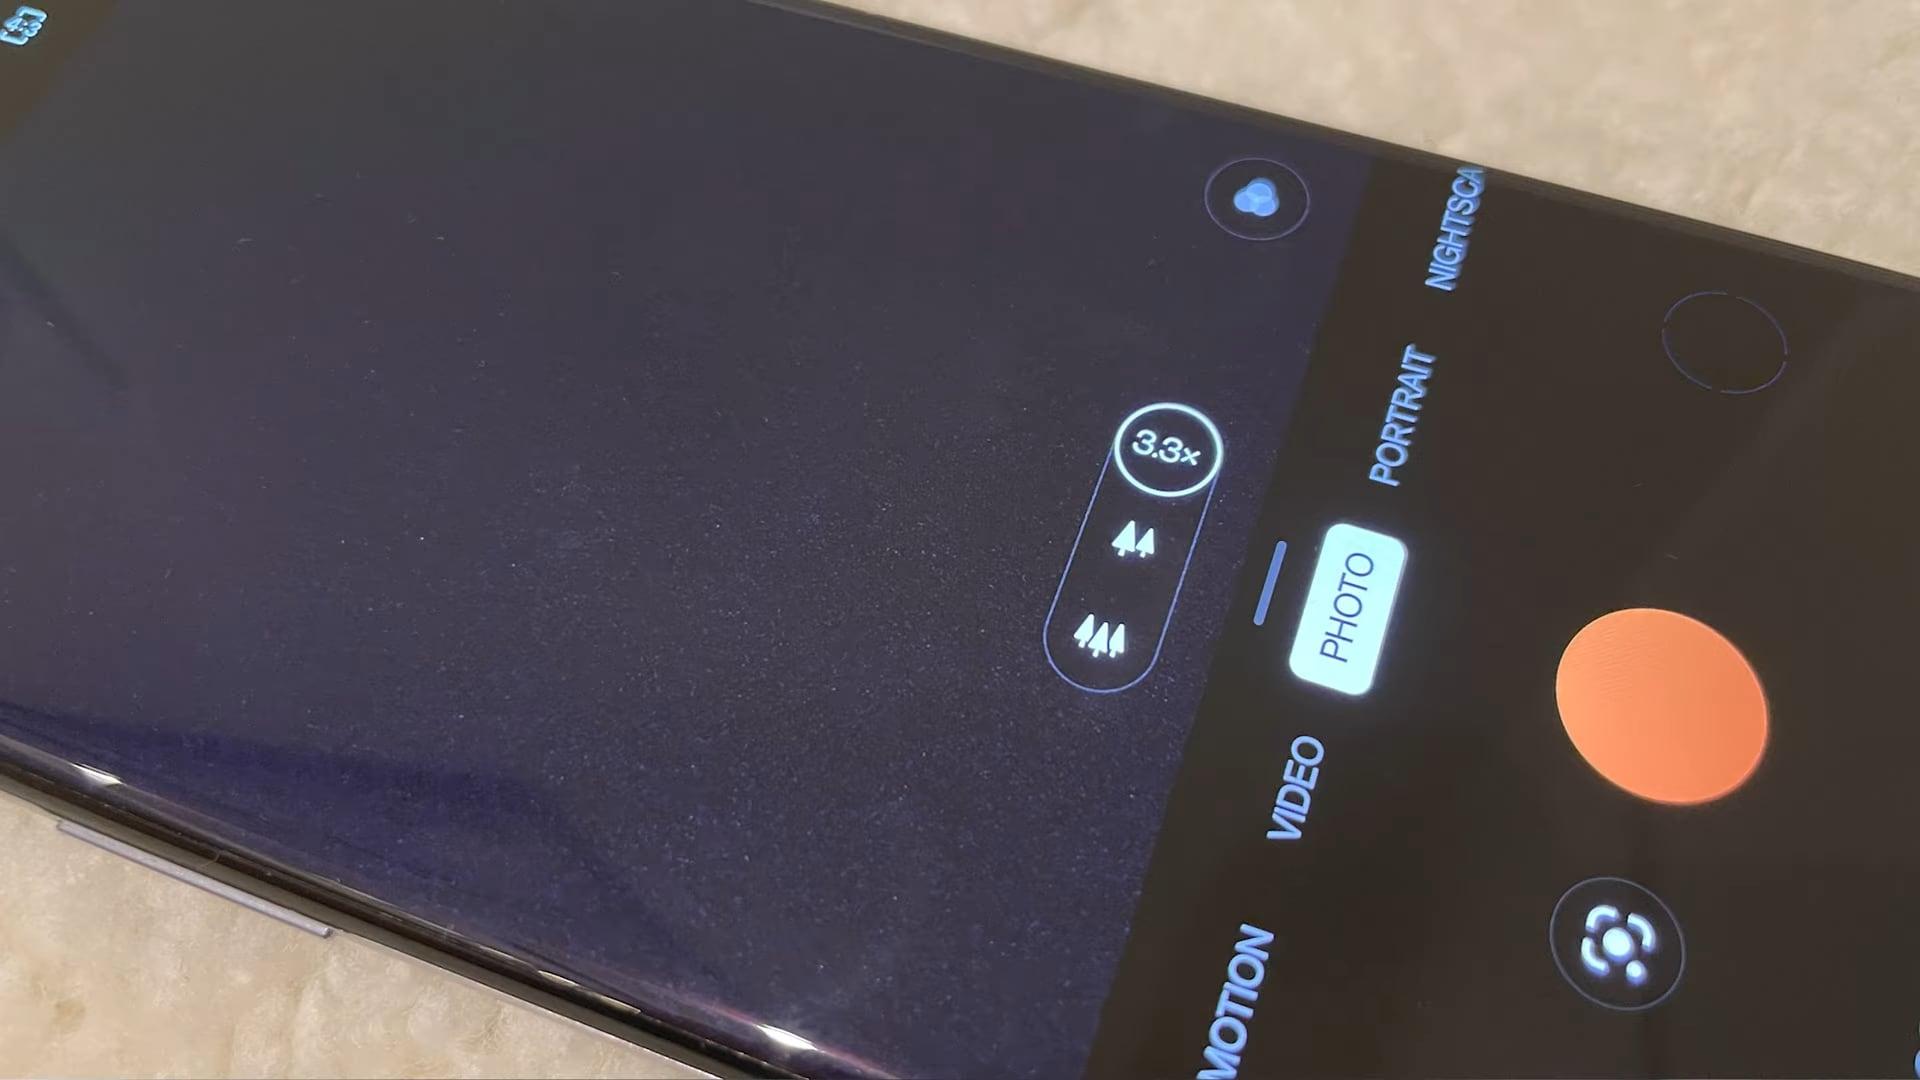 OnePlus 9 Pro – An Early Look 3-14 screenshot